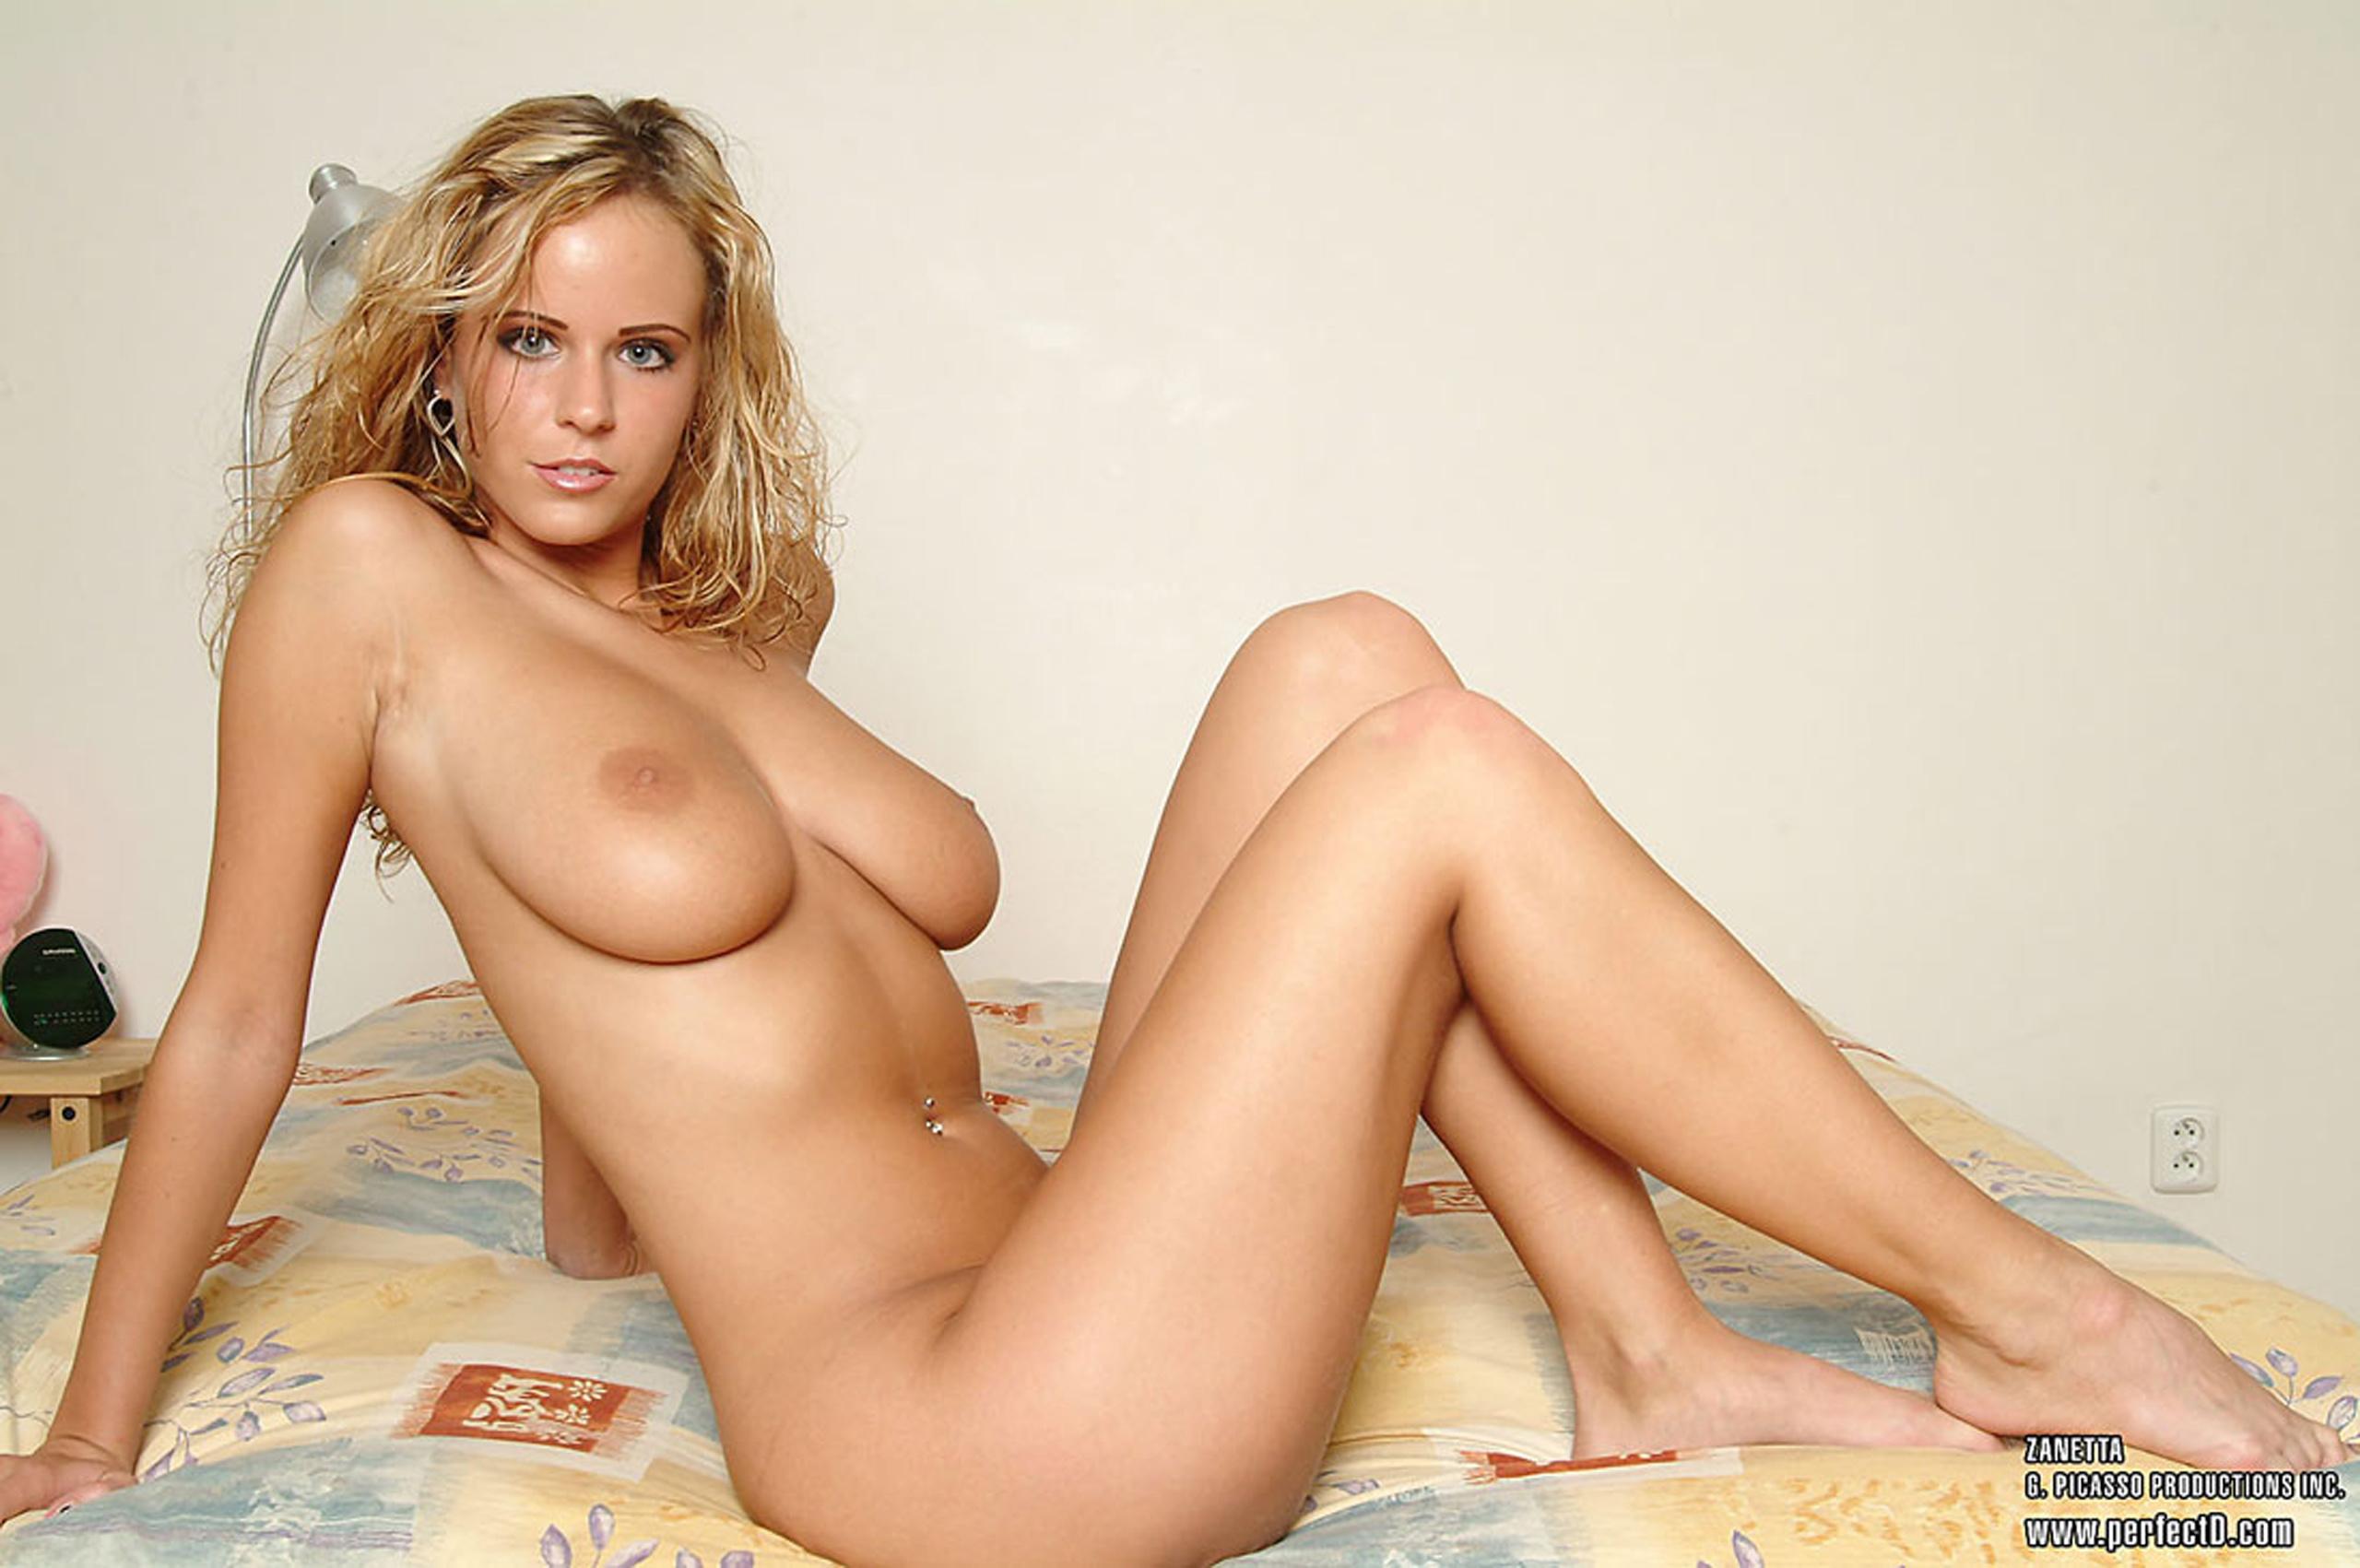 Artistic Nude Girls